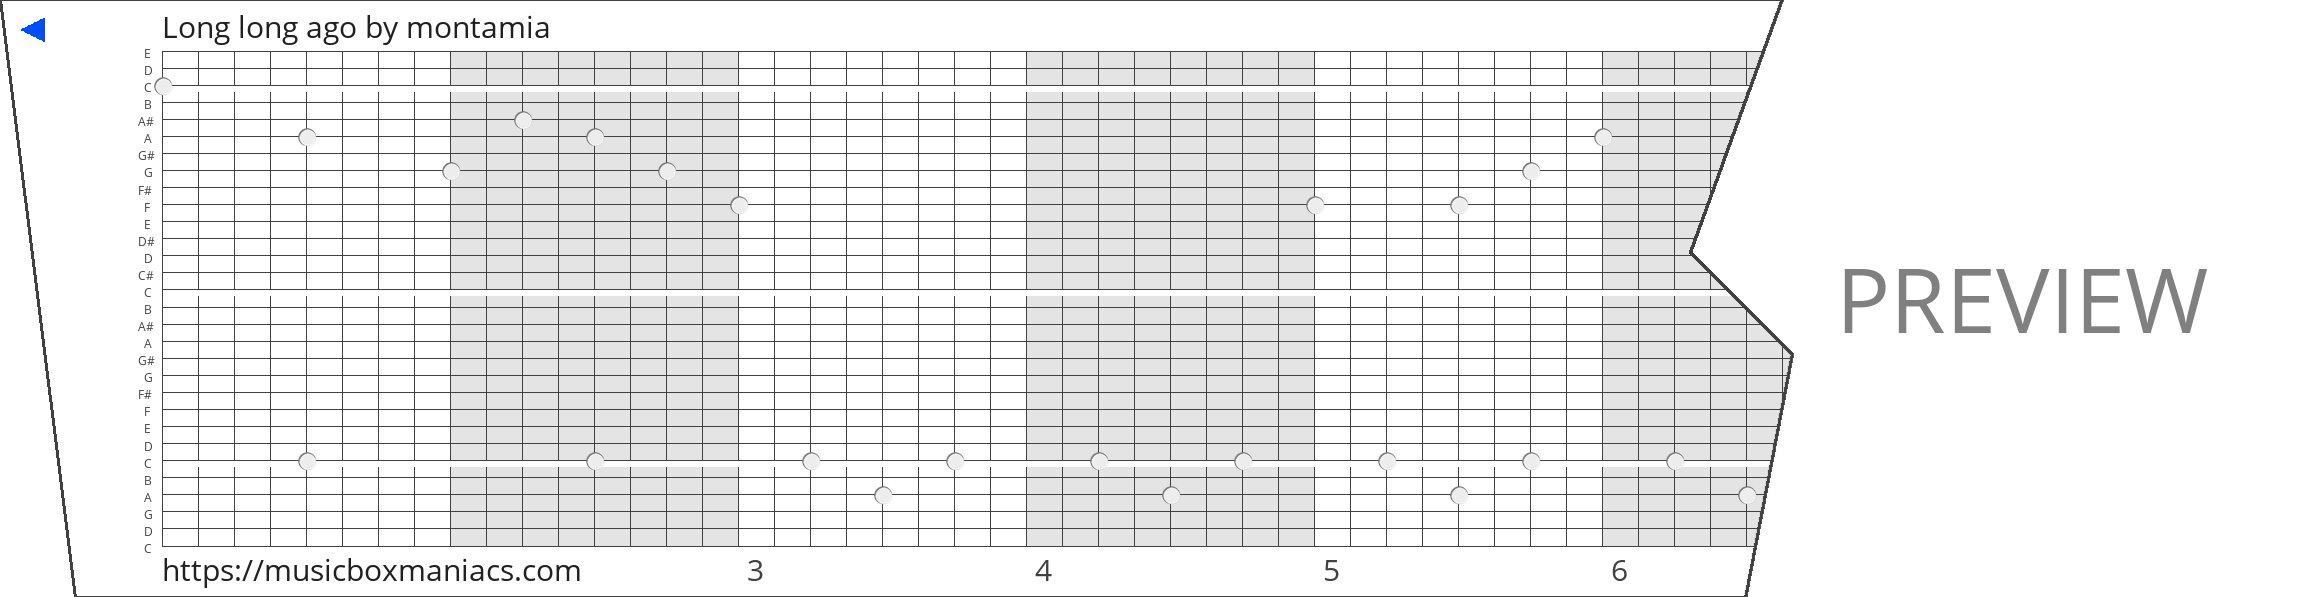 Long long ago 30 note music box paper strip